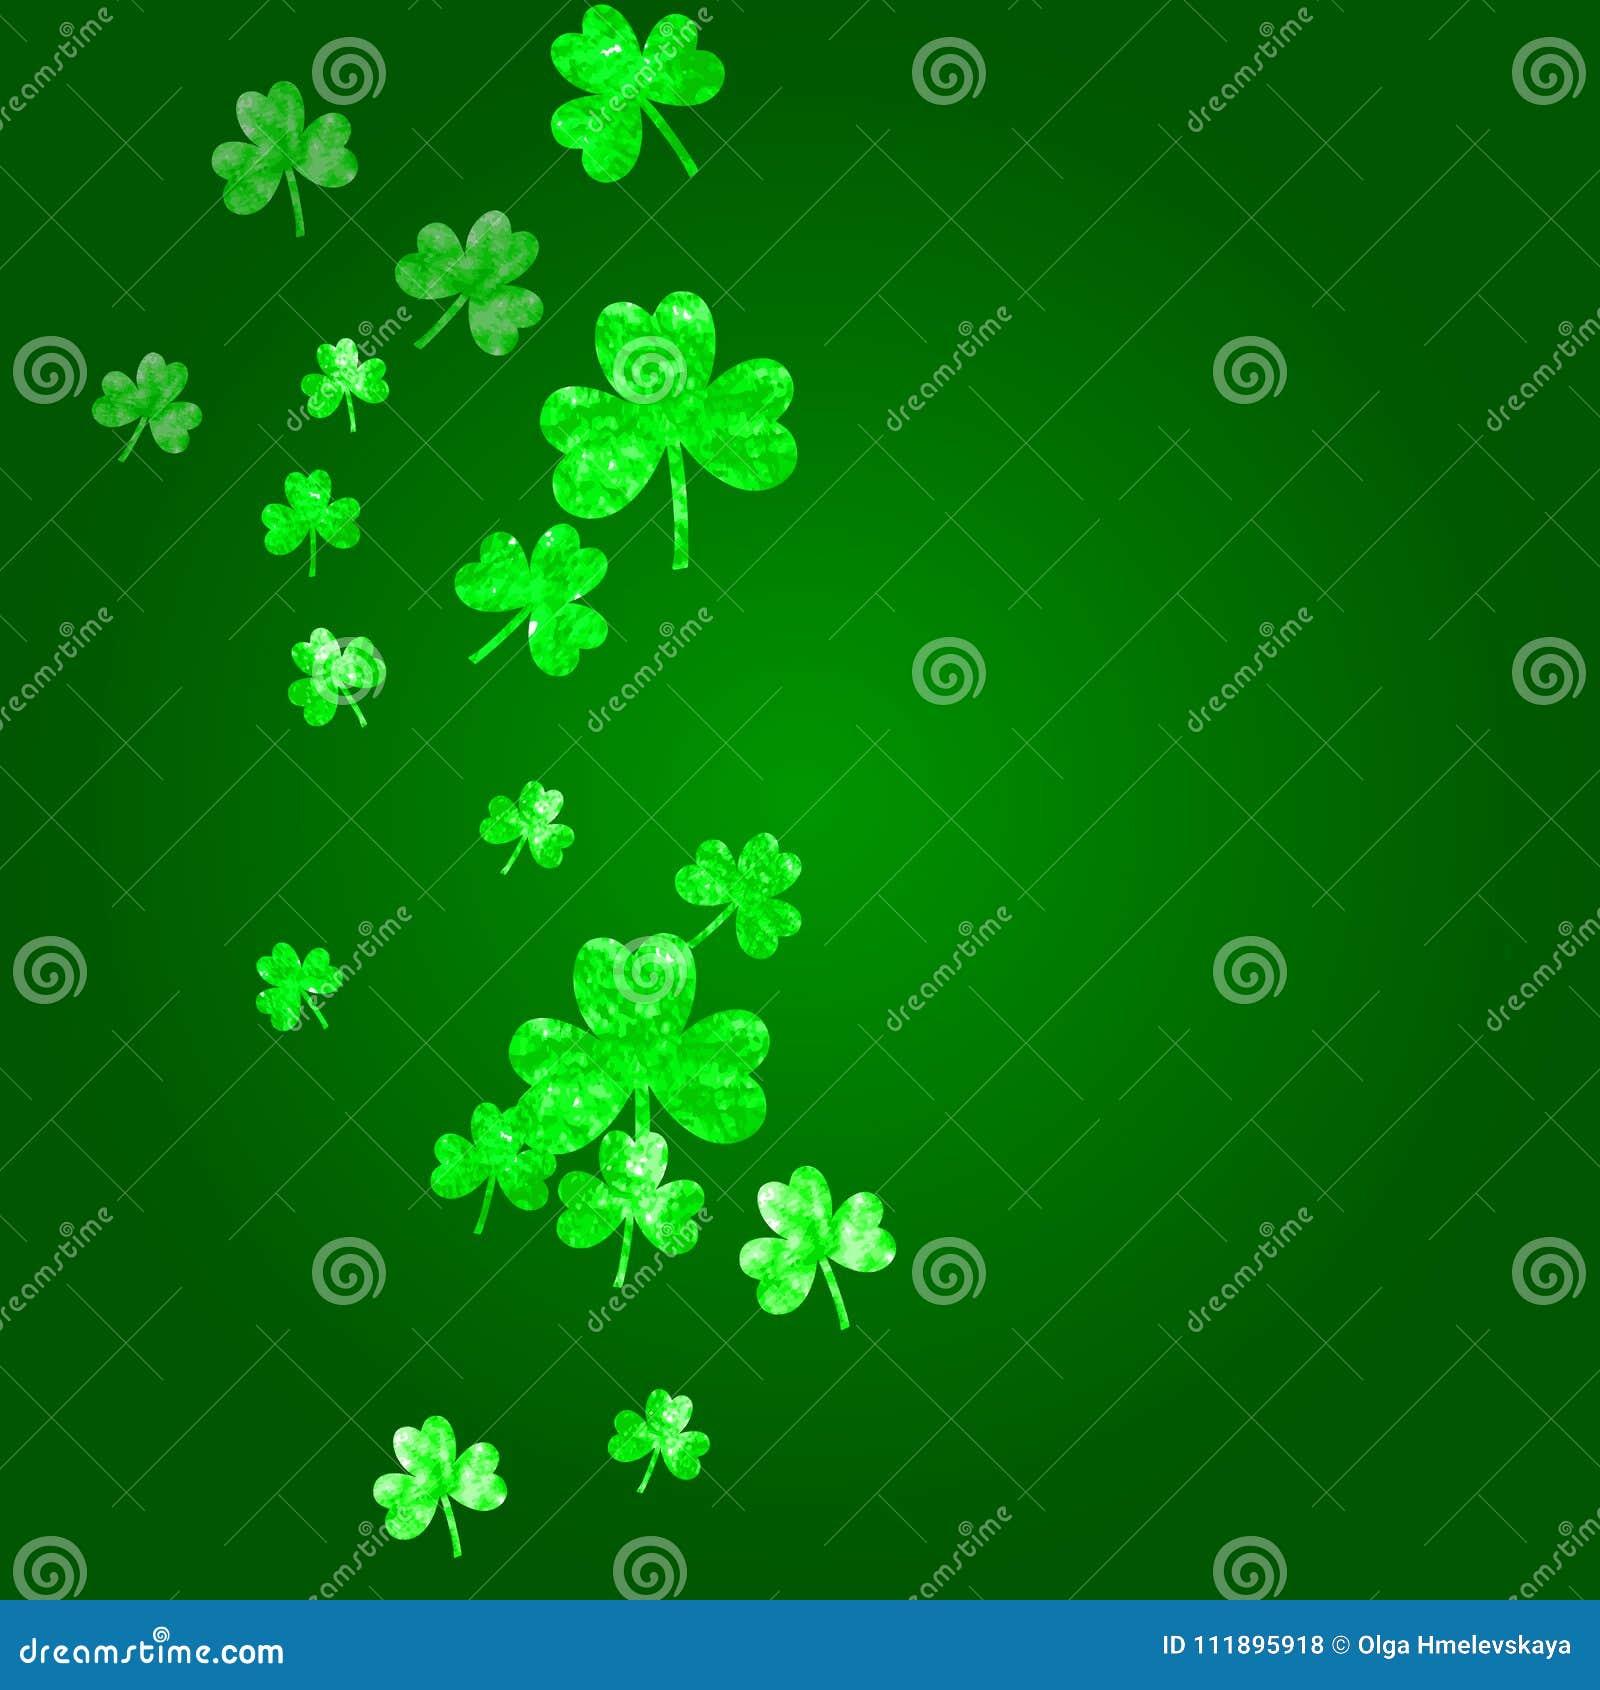 Shamrock Background For Saint Patricks Day Stock Vector